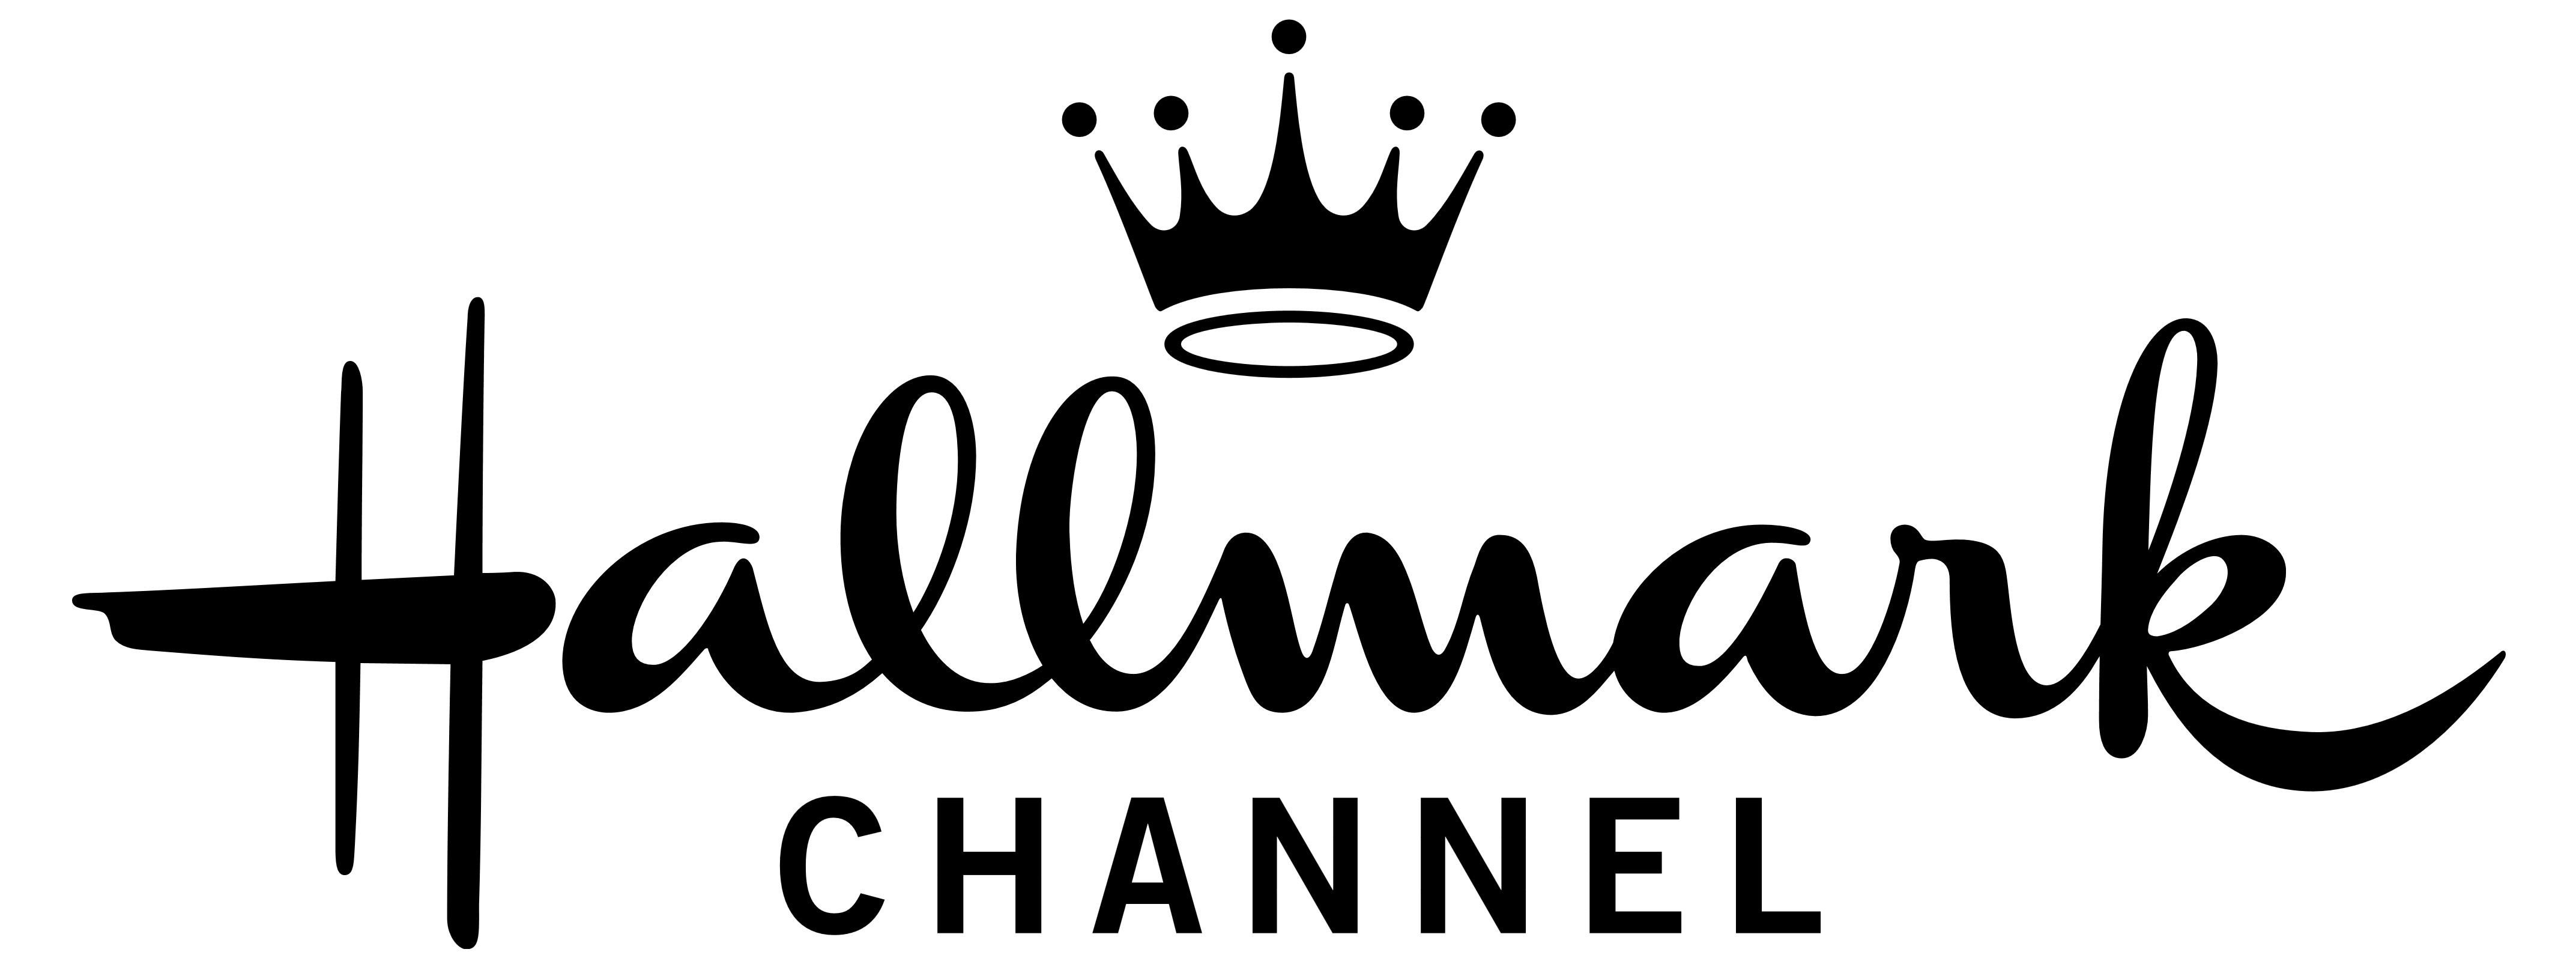 Hallmark Channel Logos Download